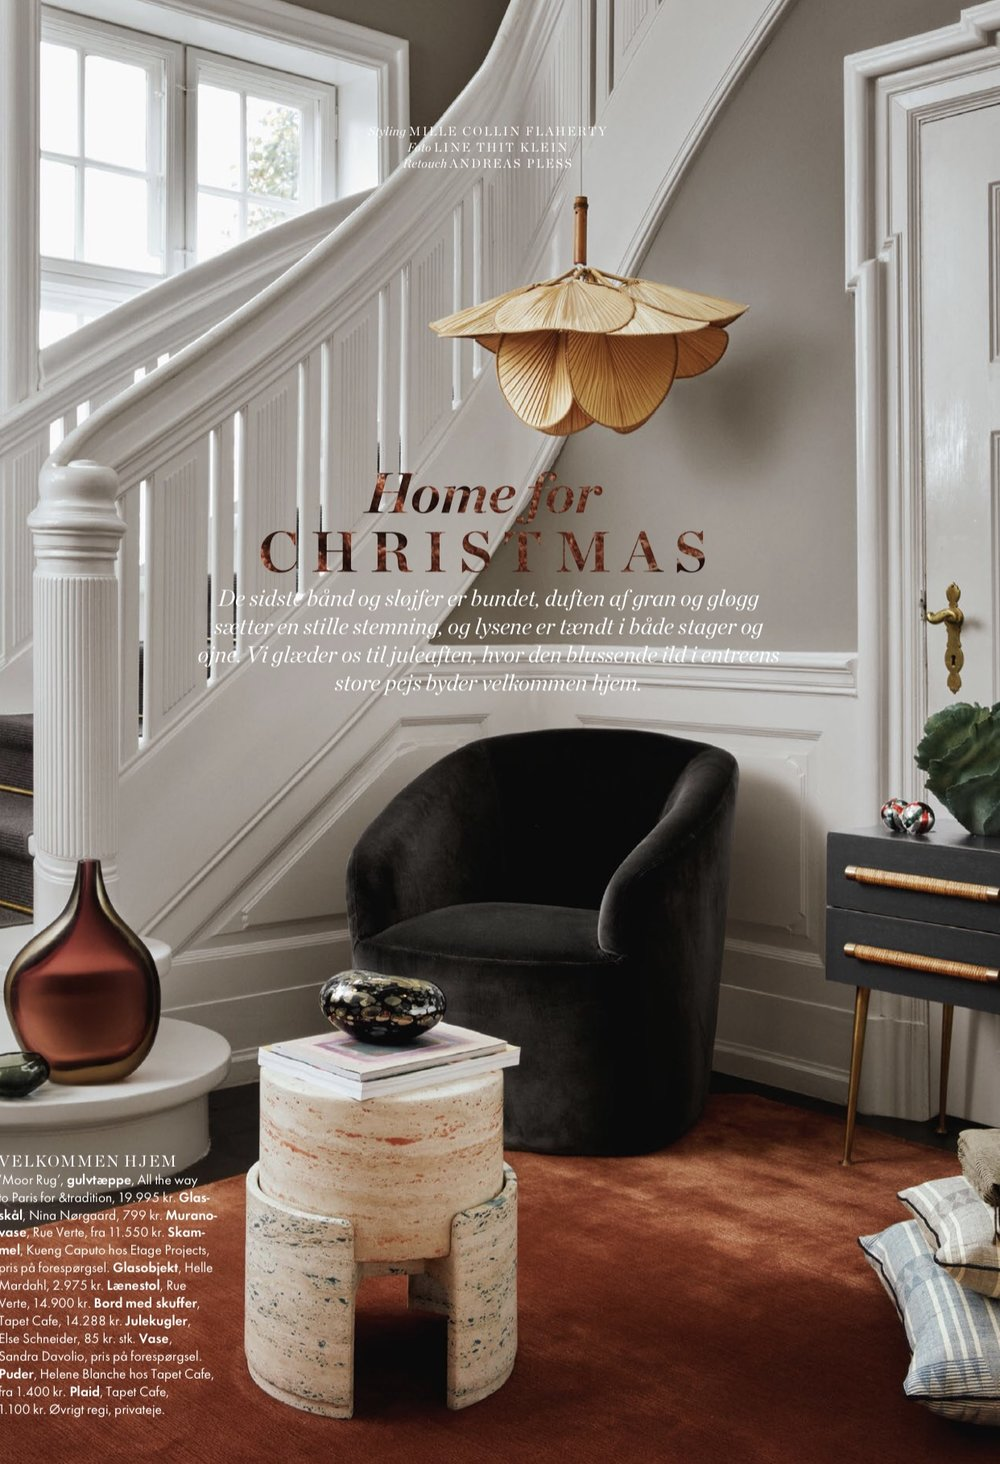 Hellemardahl_elledecoration_december.jpg